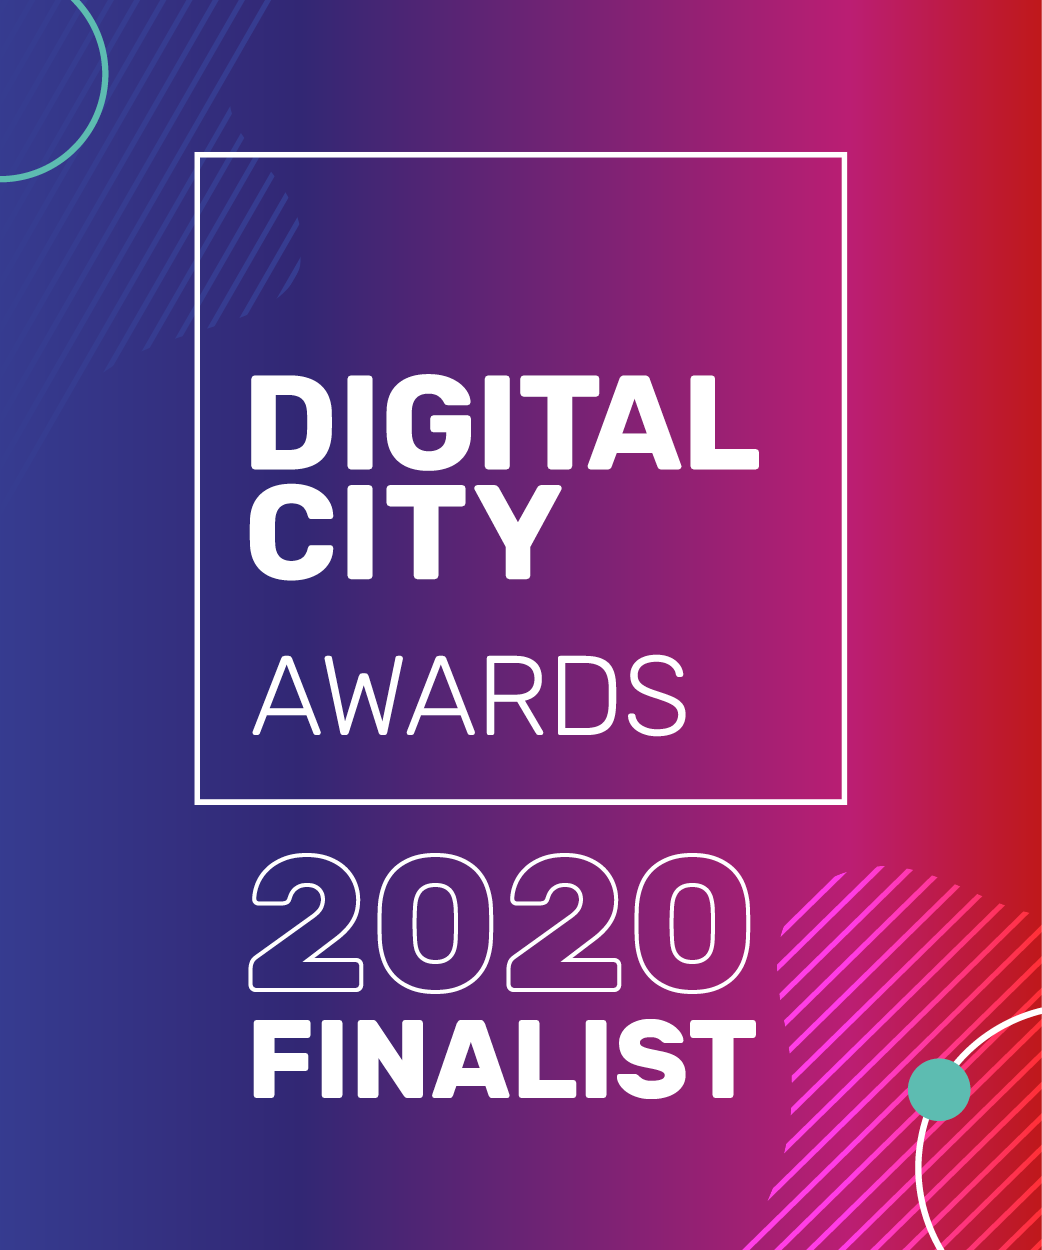 Digital City Awards - 2020 Finalist